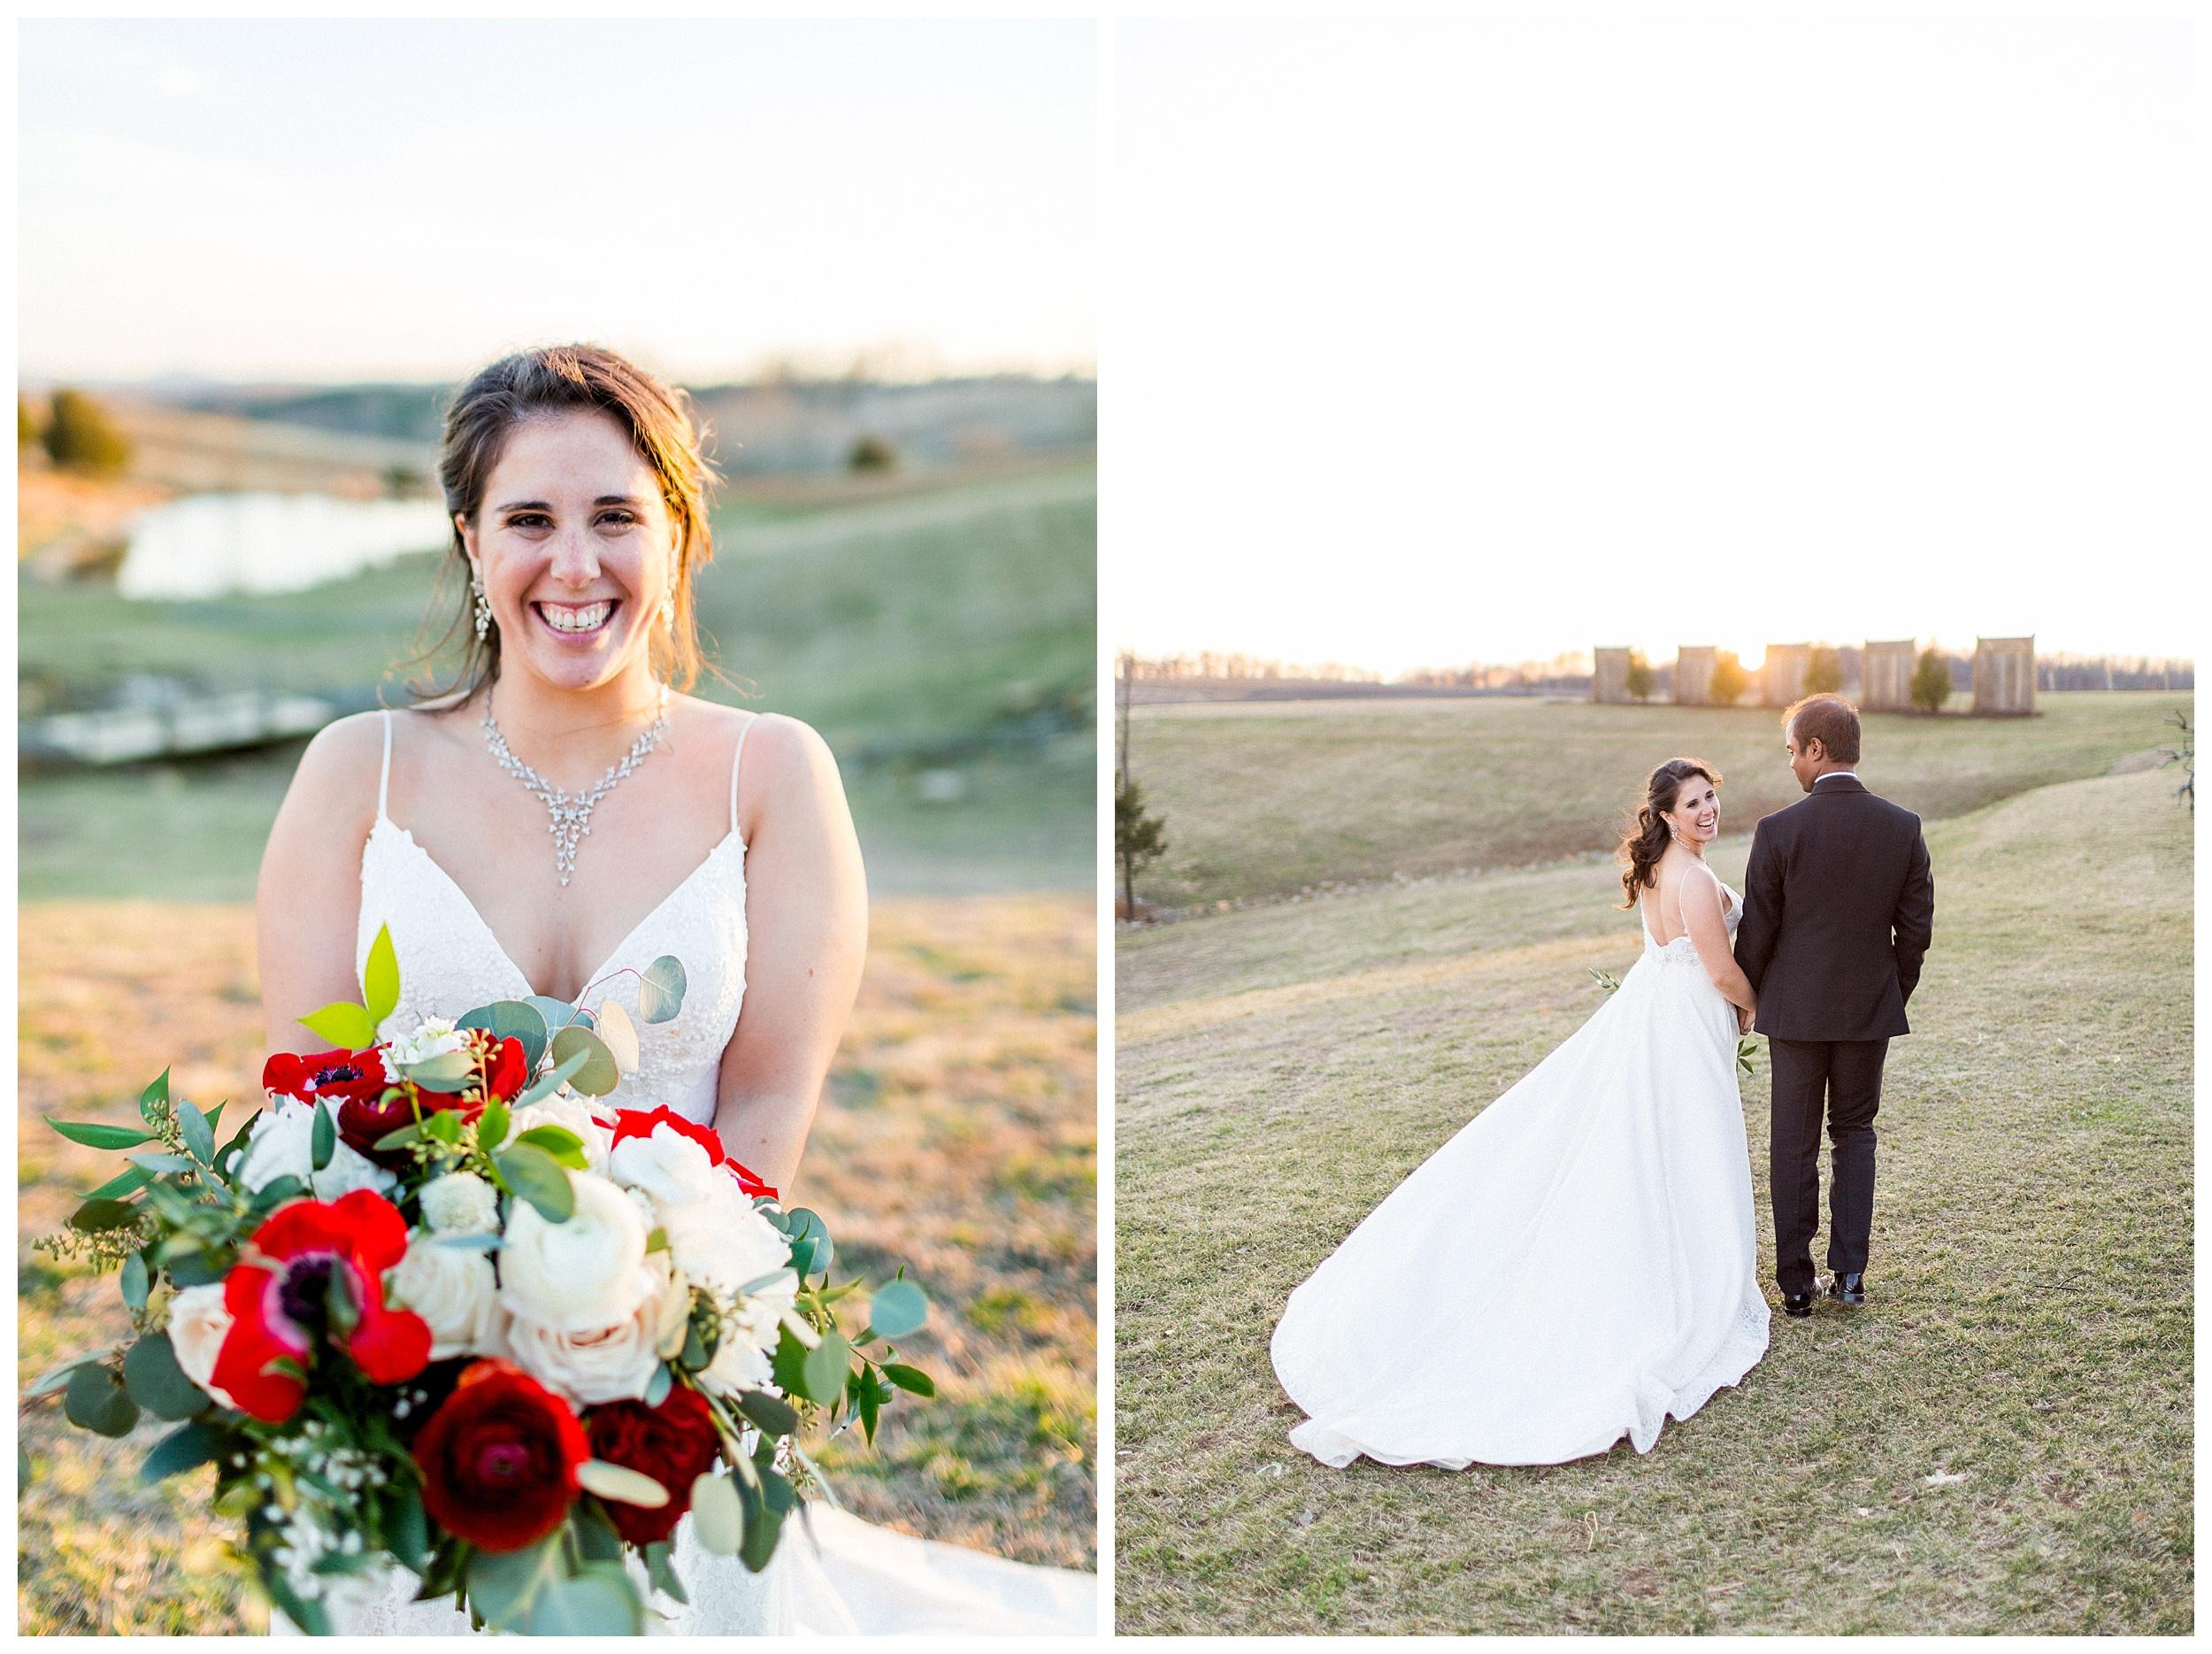 Stone Tower Winery Wedding | Virginia Winter Wedding | VA Wedding Photographer Kir Tuben_0105.jpg